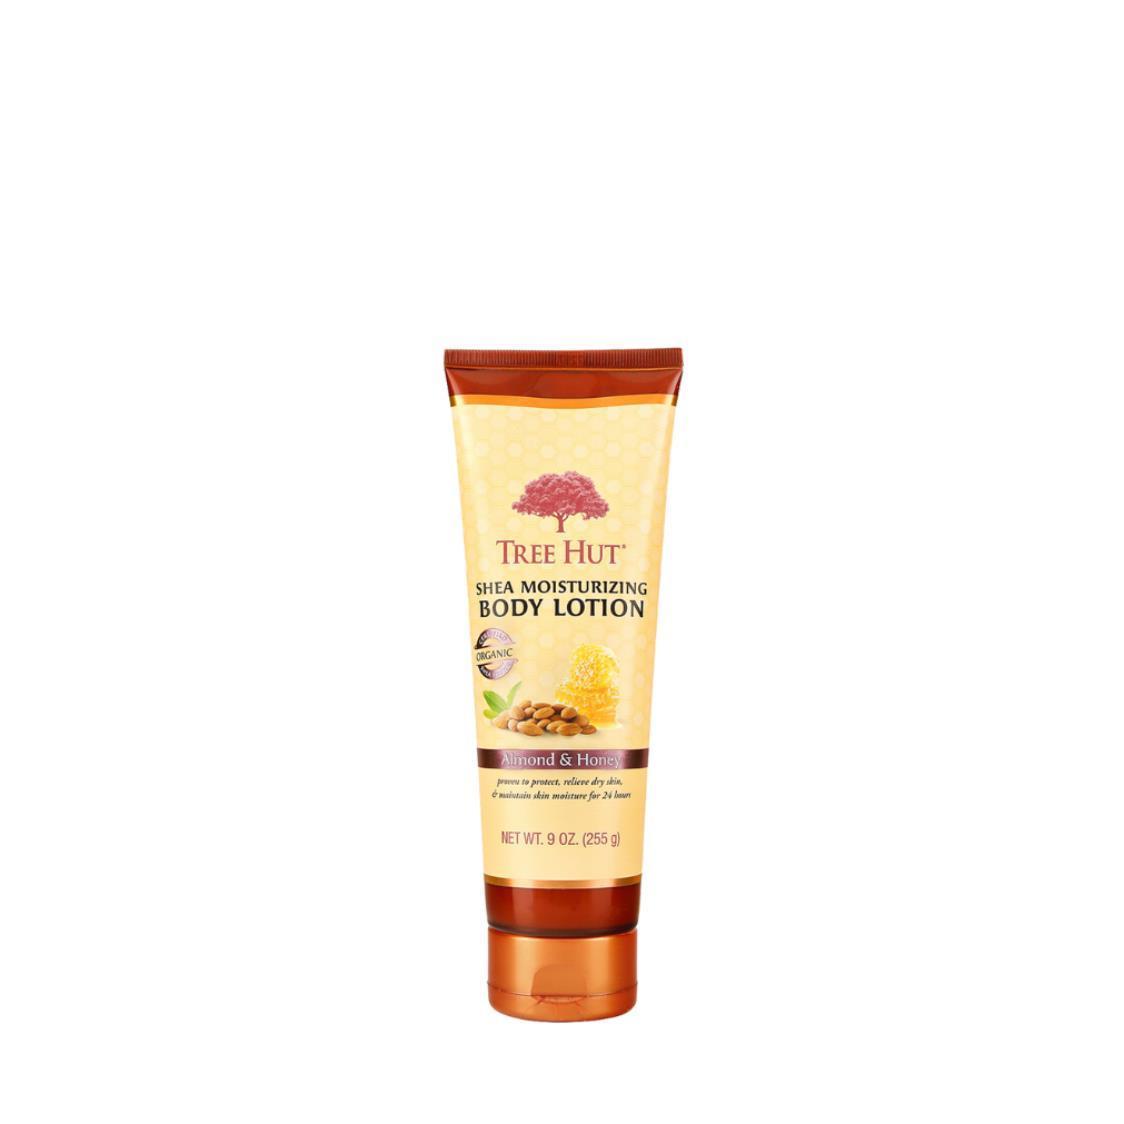 Shea Moisturizing Body Lotion Almond  Honey 9oz 255g